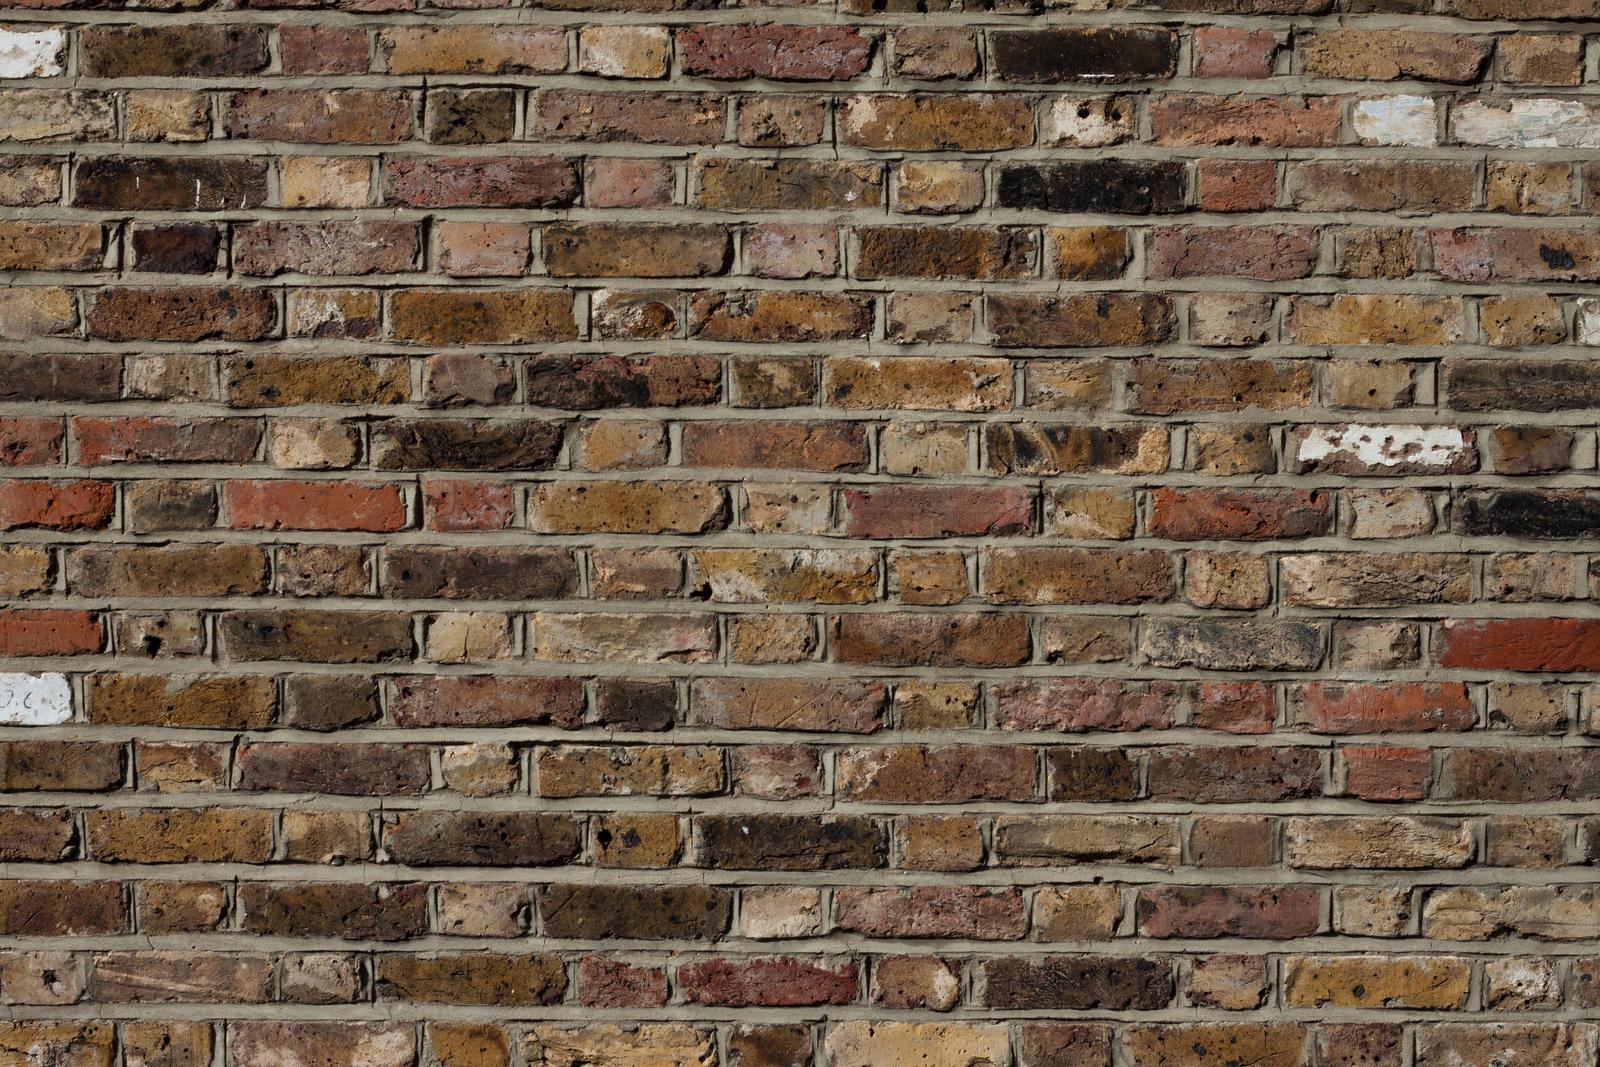 Home Design Software Building Blocks Free Download Brick Texture 1 By Hhh316 On Deviantart